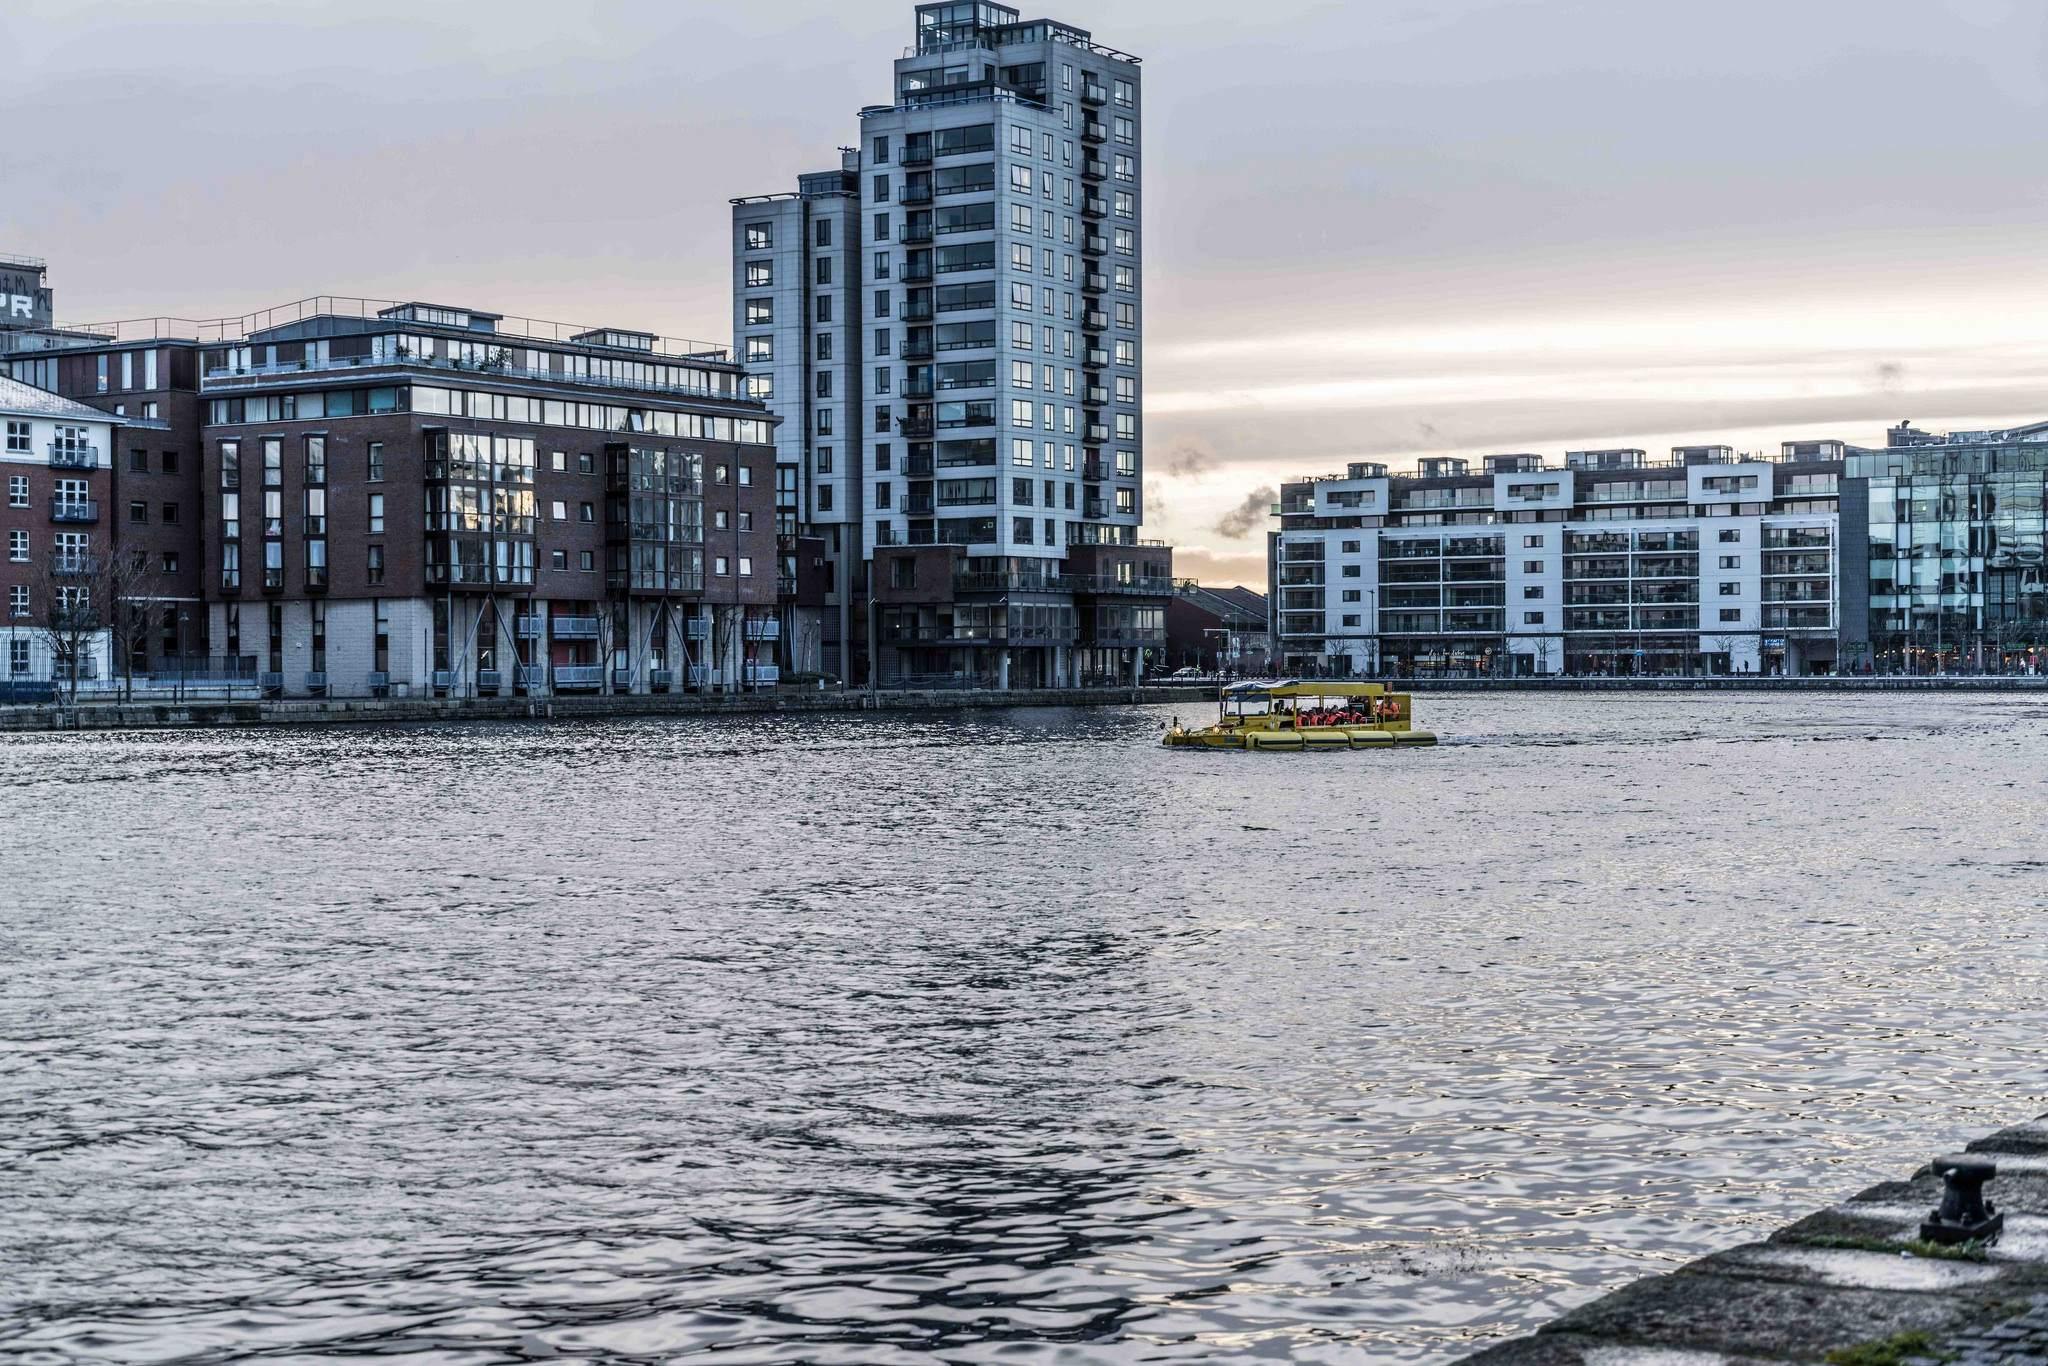 dublin docklands2 Walking Around Dublin Docklands by Marphy